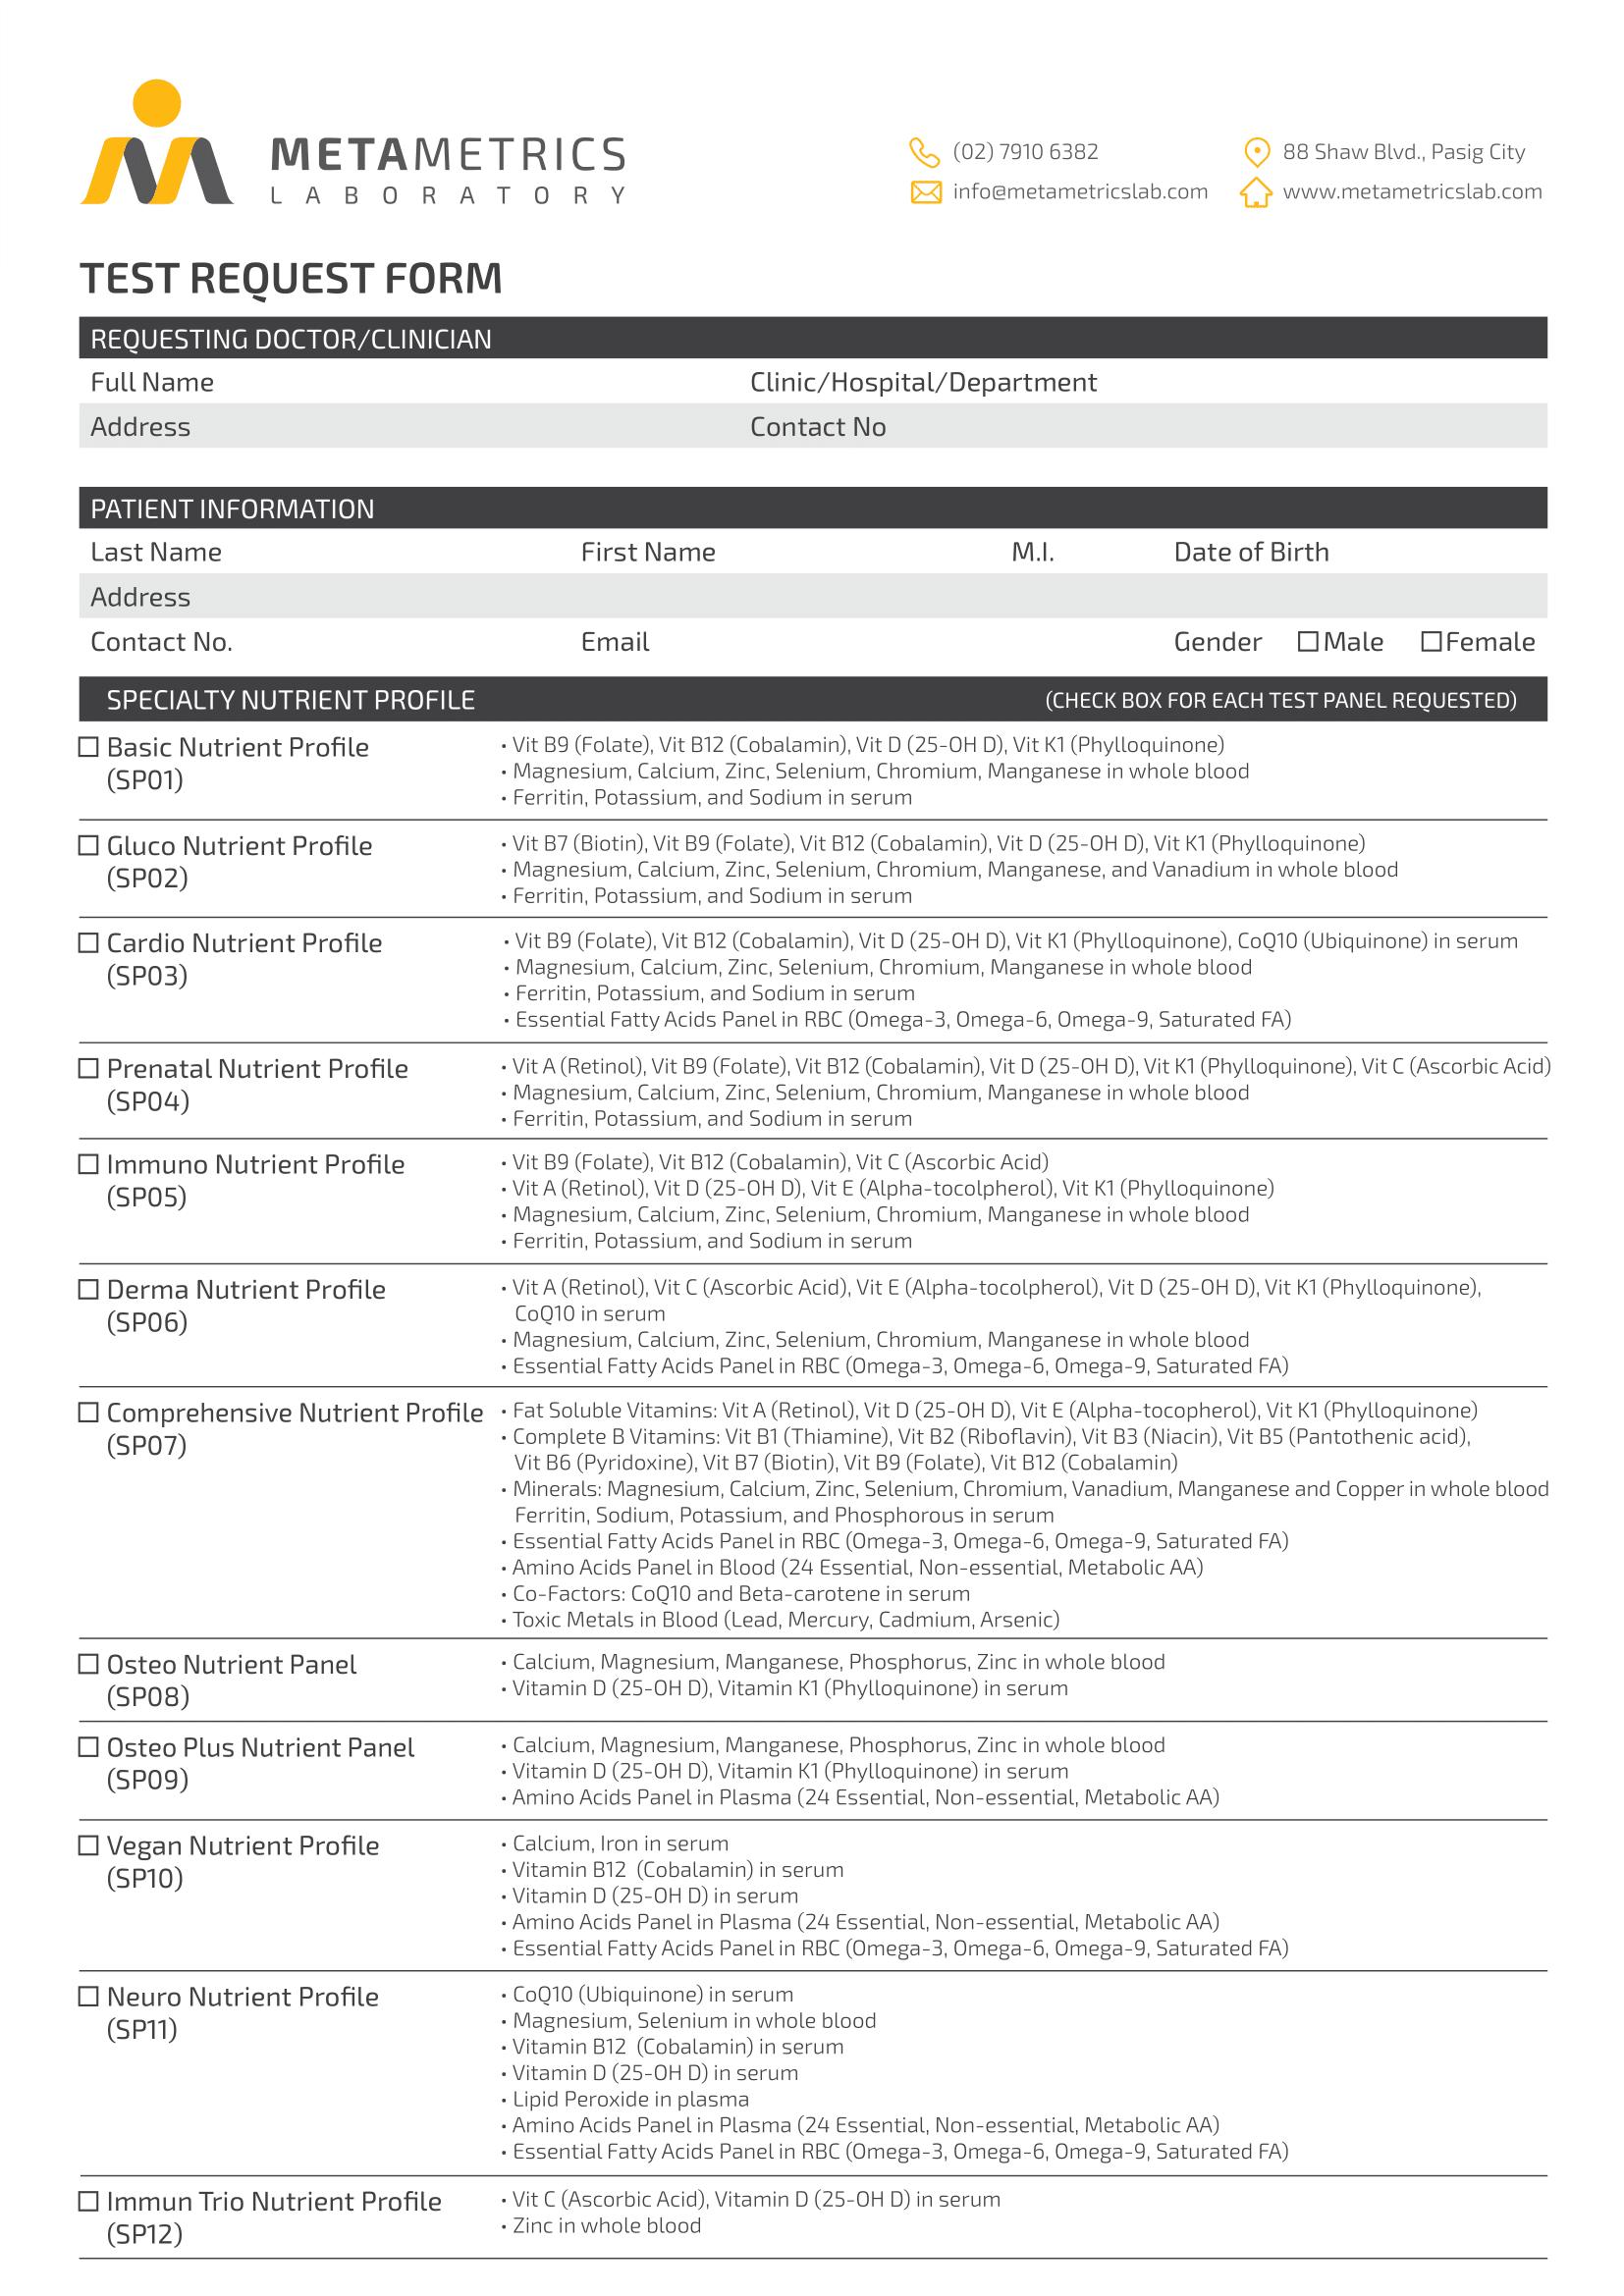 MetaMetrics Laboratory Diagnostic Test Request Form